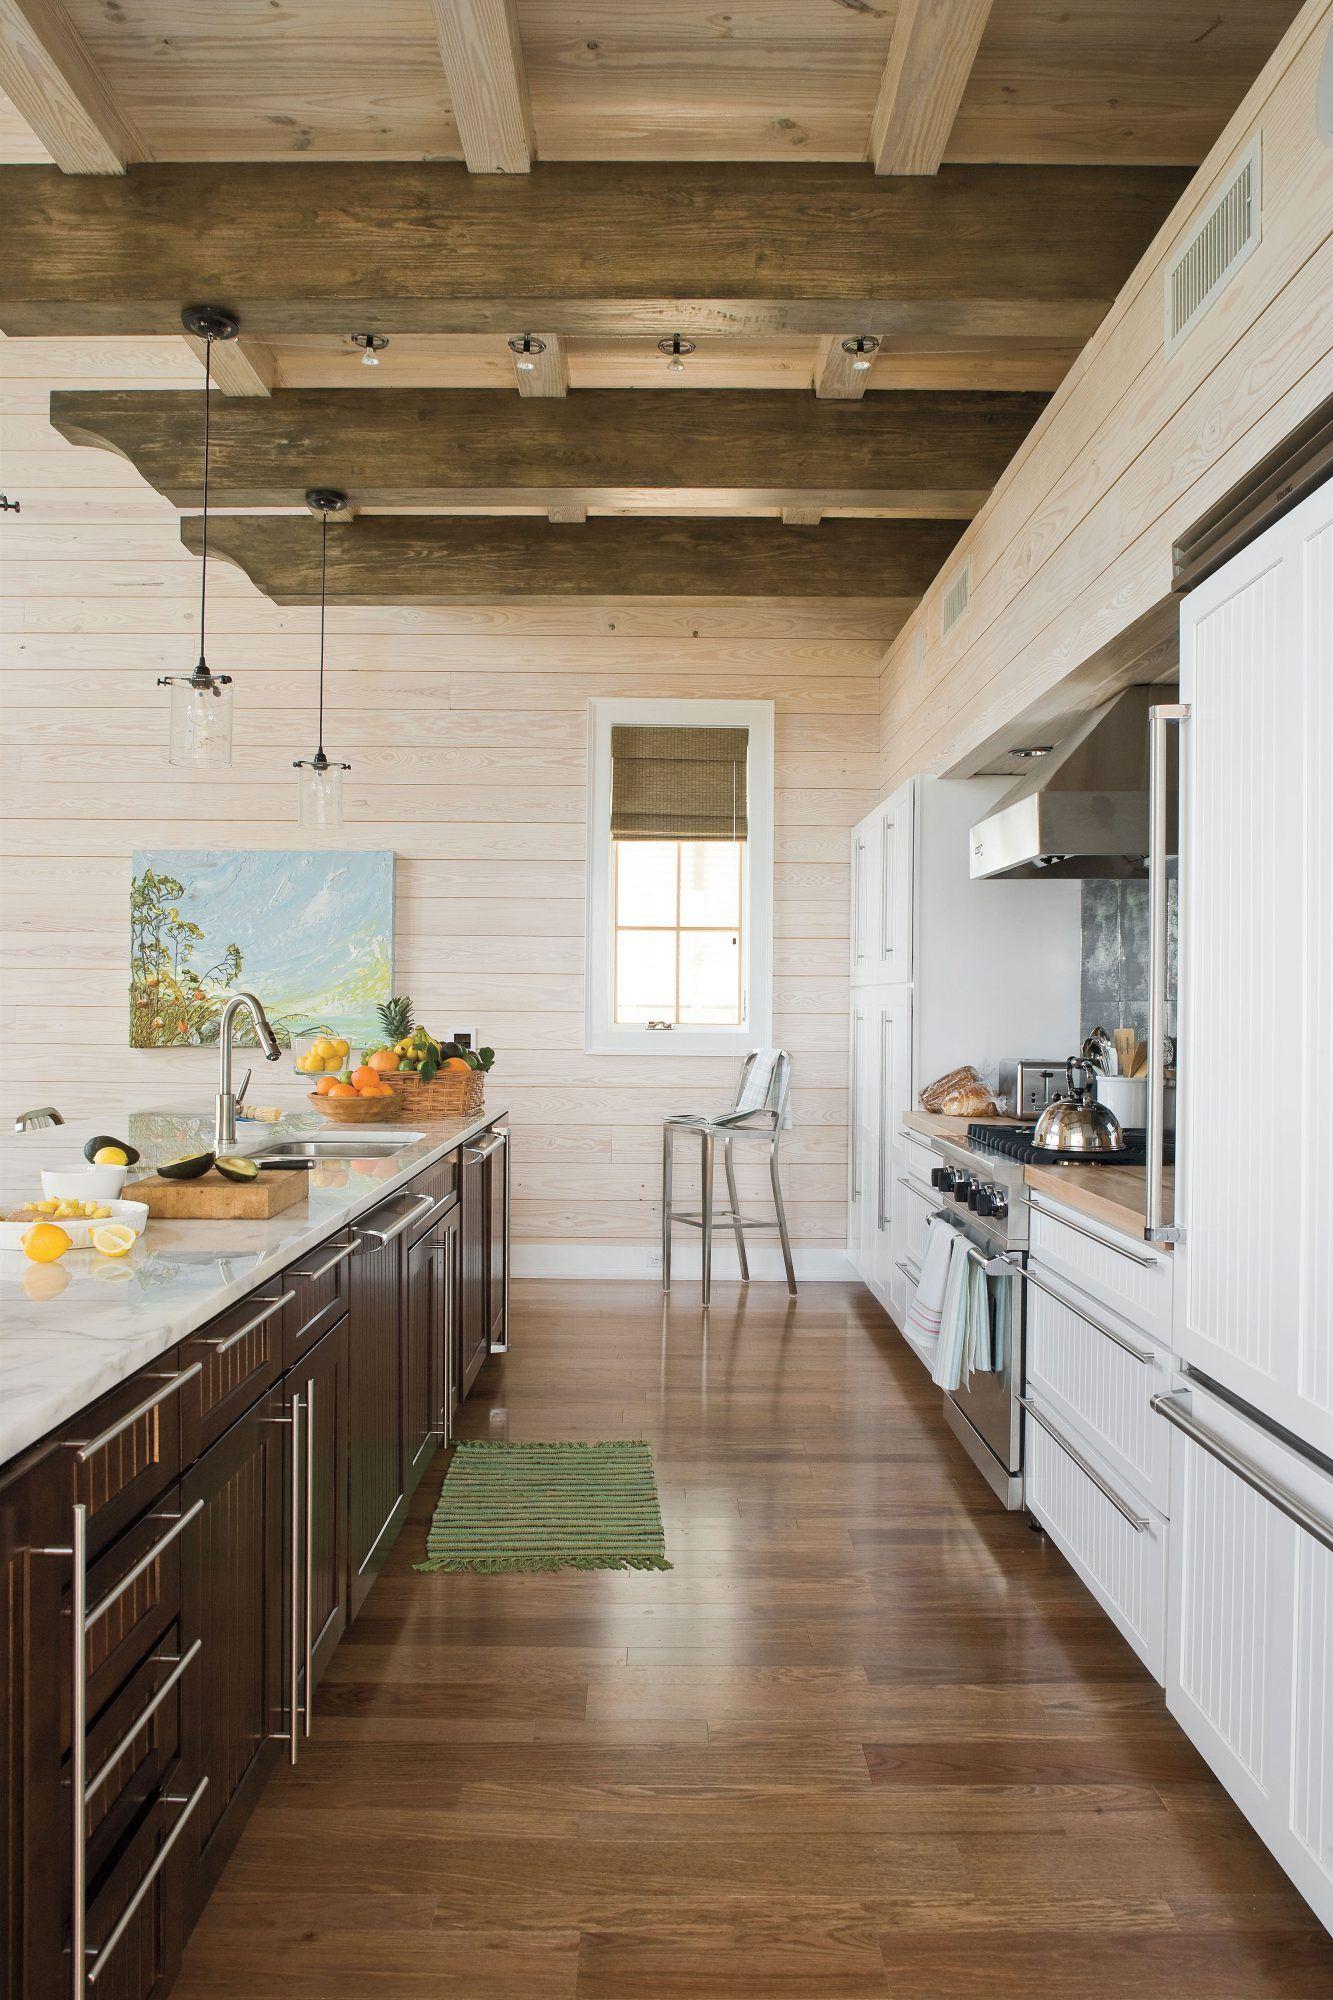 dream kitchen must haves espresso kitchen cabinets kitchen remodel wood floor design on kitchen remodel must haves id=63299